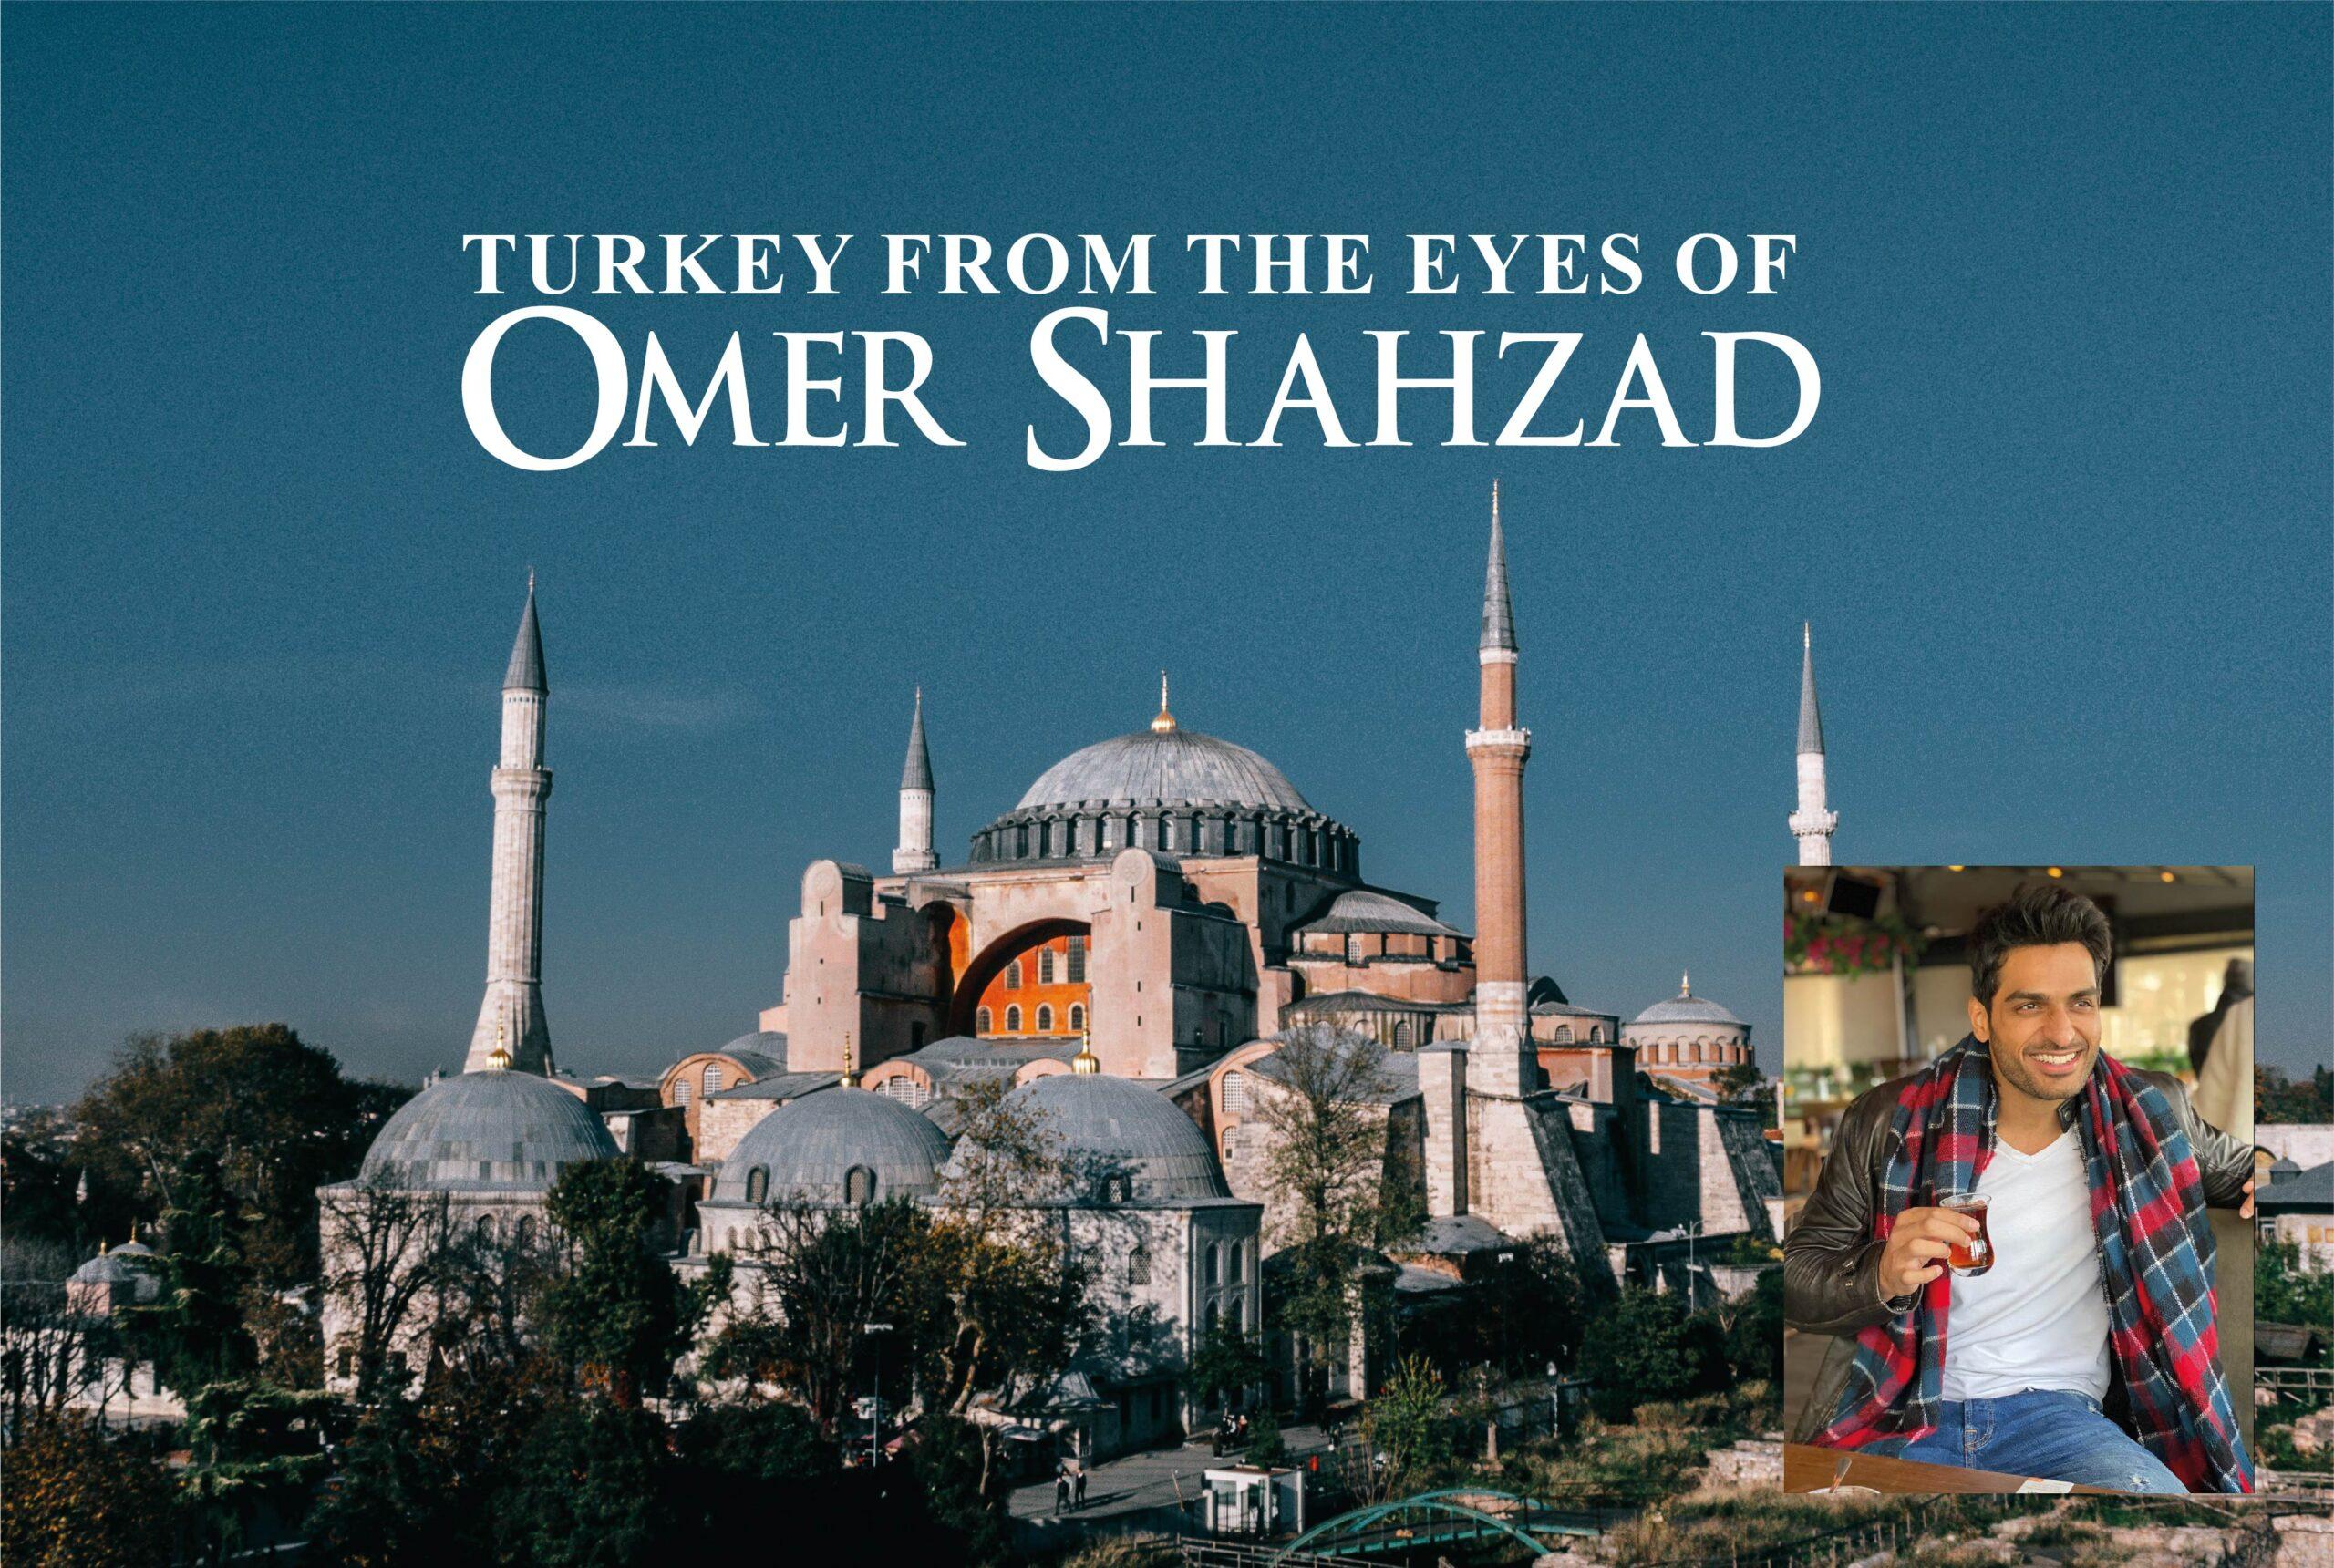 Turkey from the eyes of Omer Shahzad